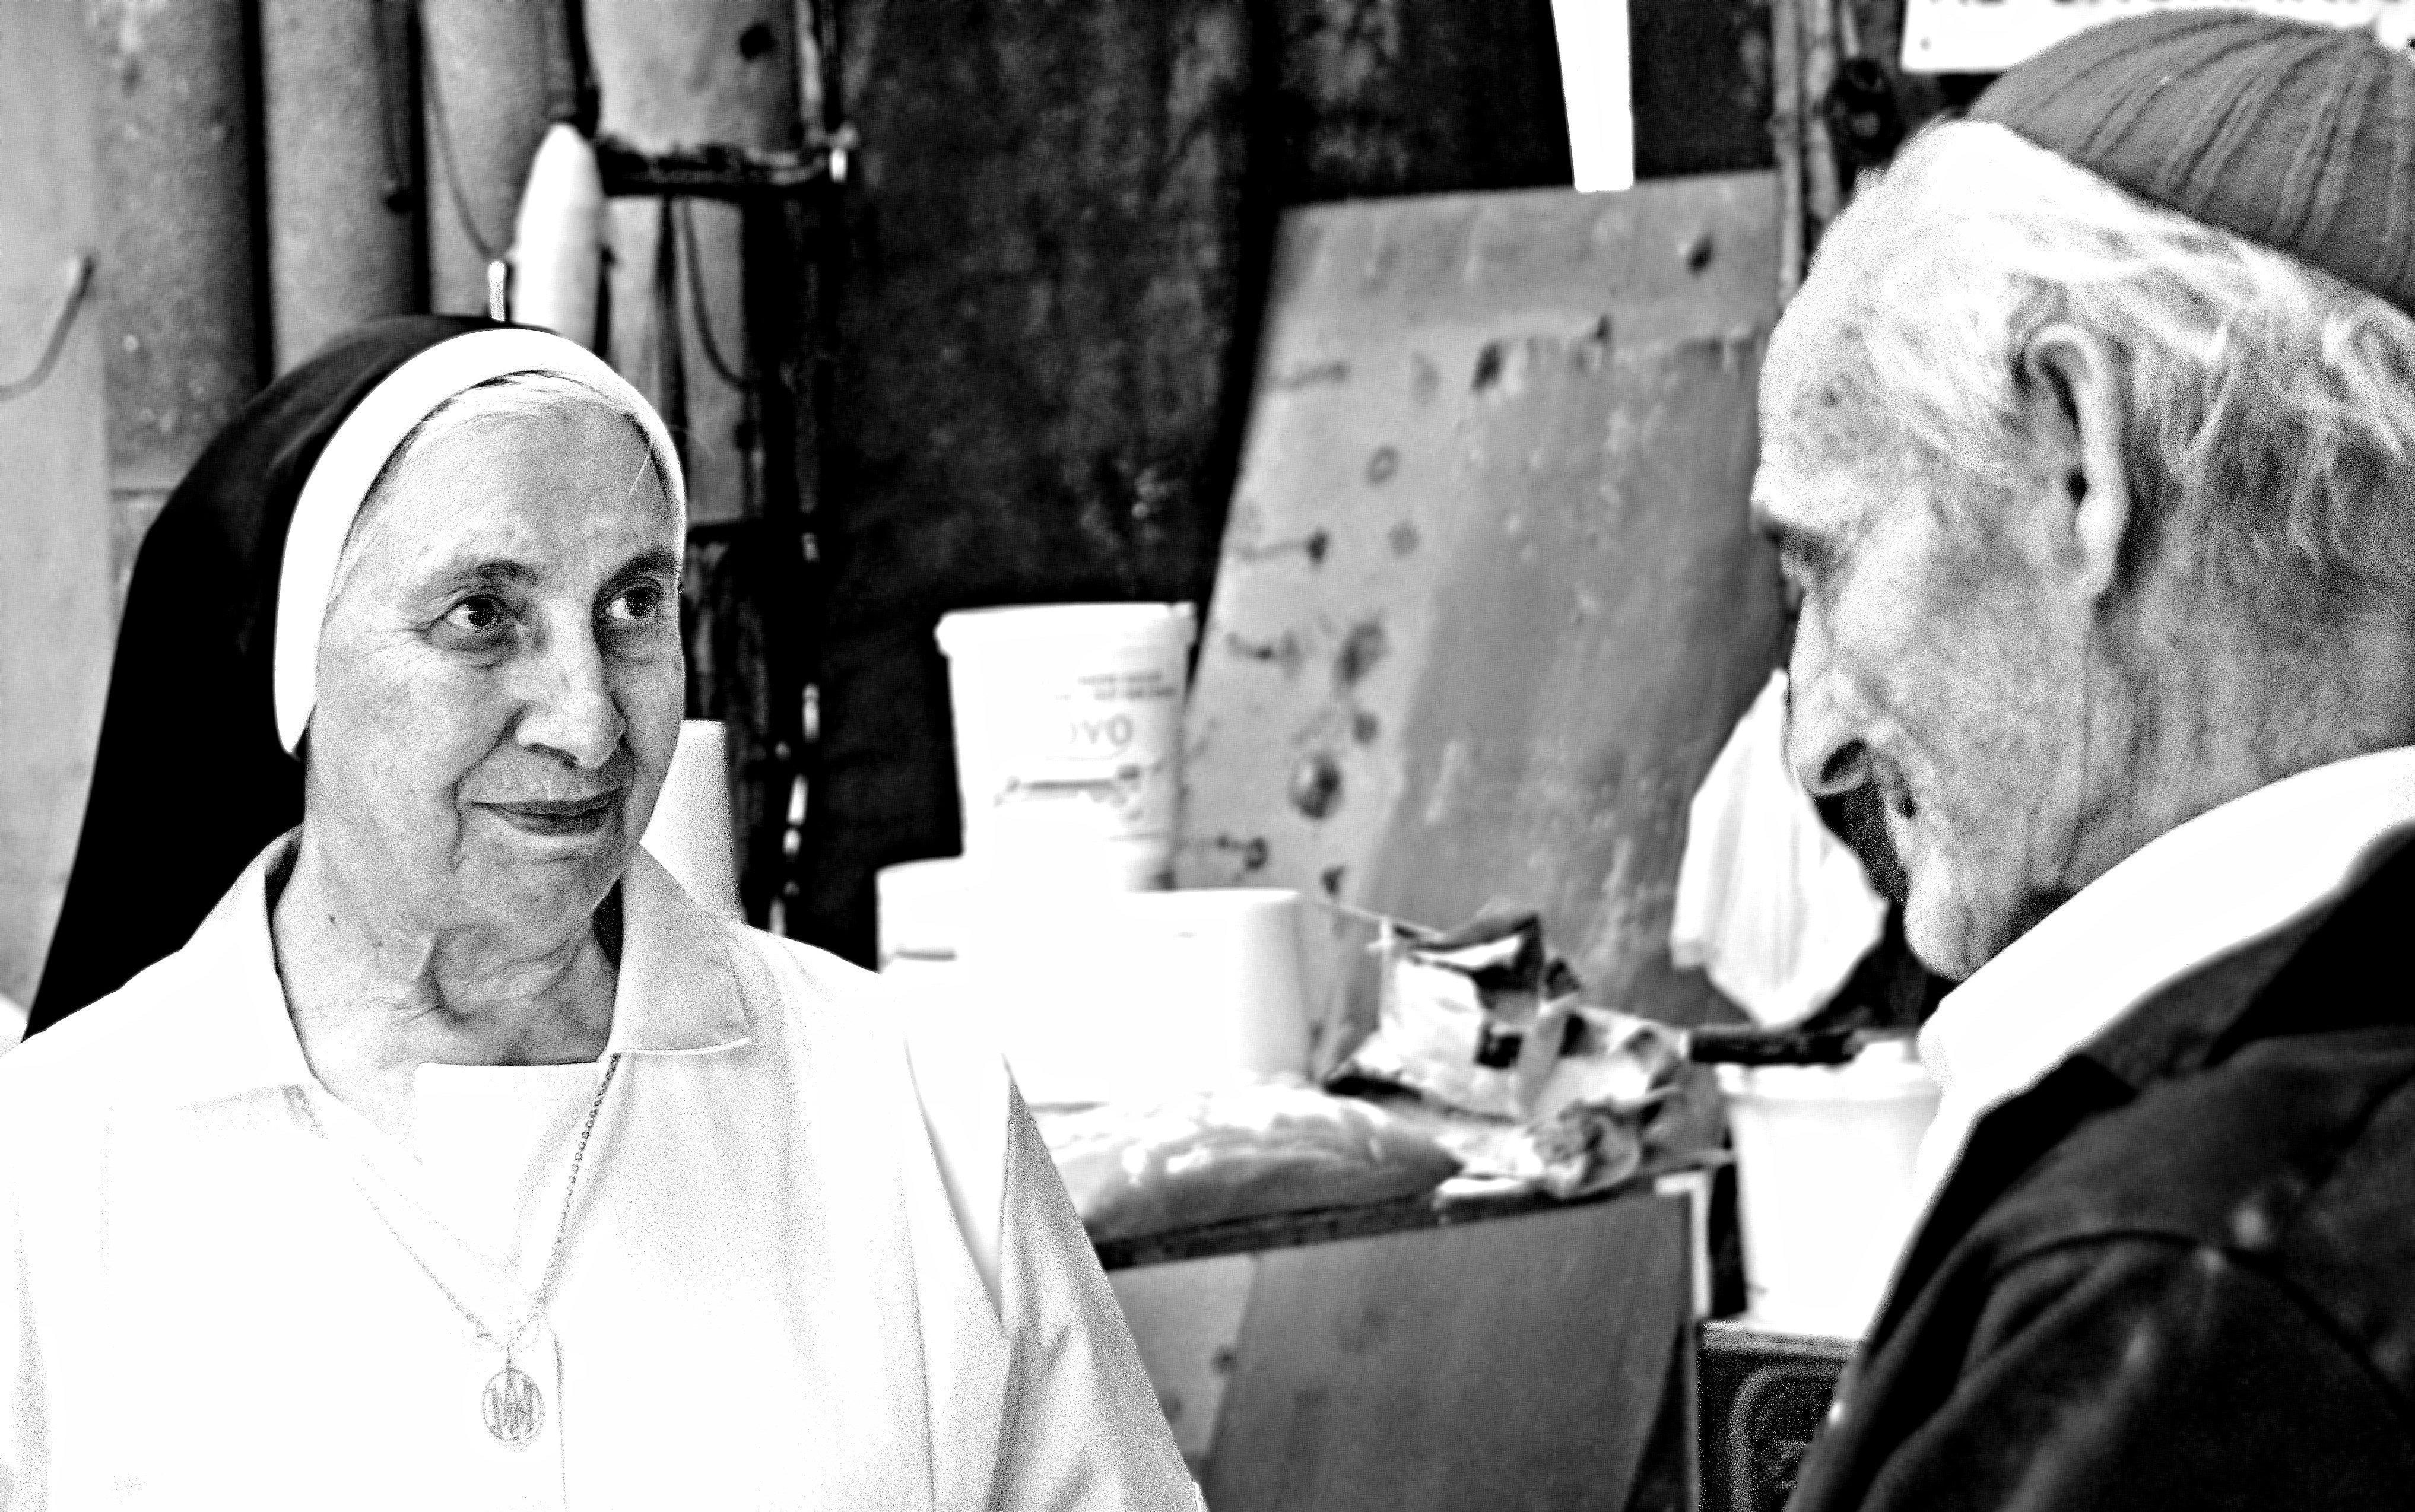 Justo Gallego Martínez et une religieuse